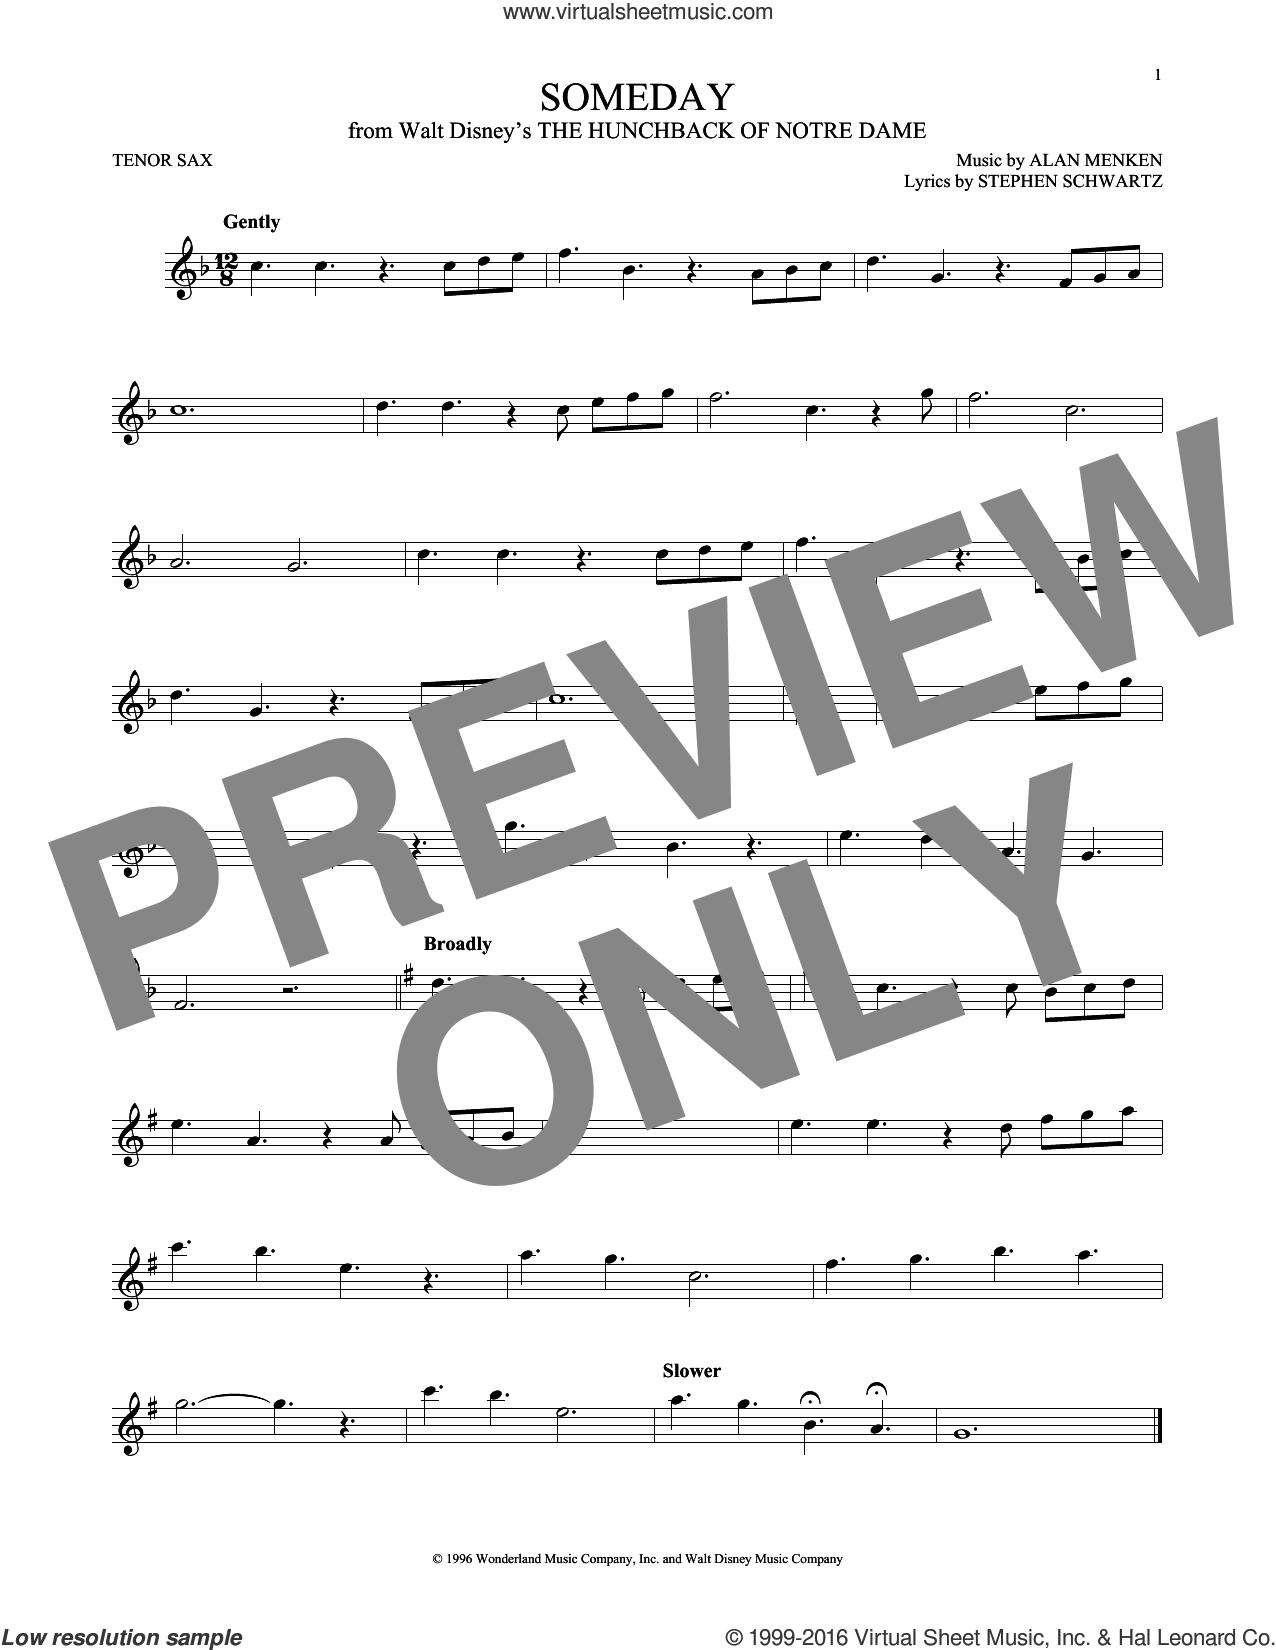 Someday (Esmeralda's Prayer) sheet music for tenor saxophone solo by Alan Menken, Donna Summer and Stephen Schwartz, intermediate skill level